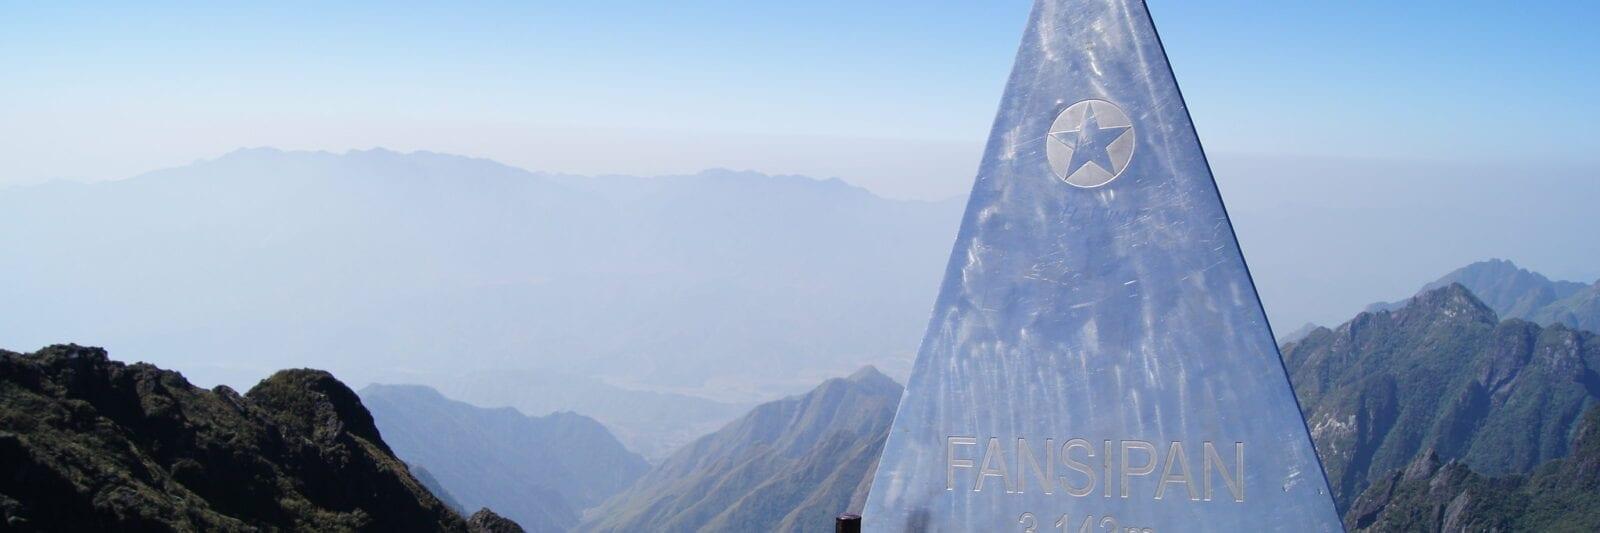 Image of the metal statue denoting Fansipan Mountain in Vietnam